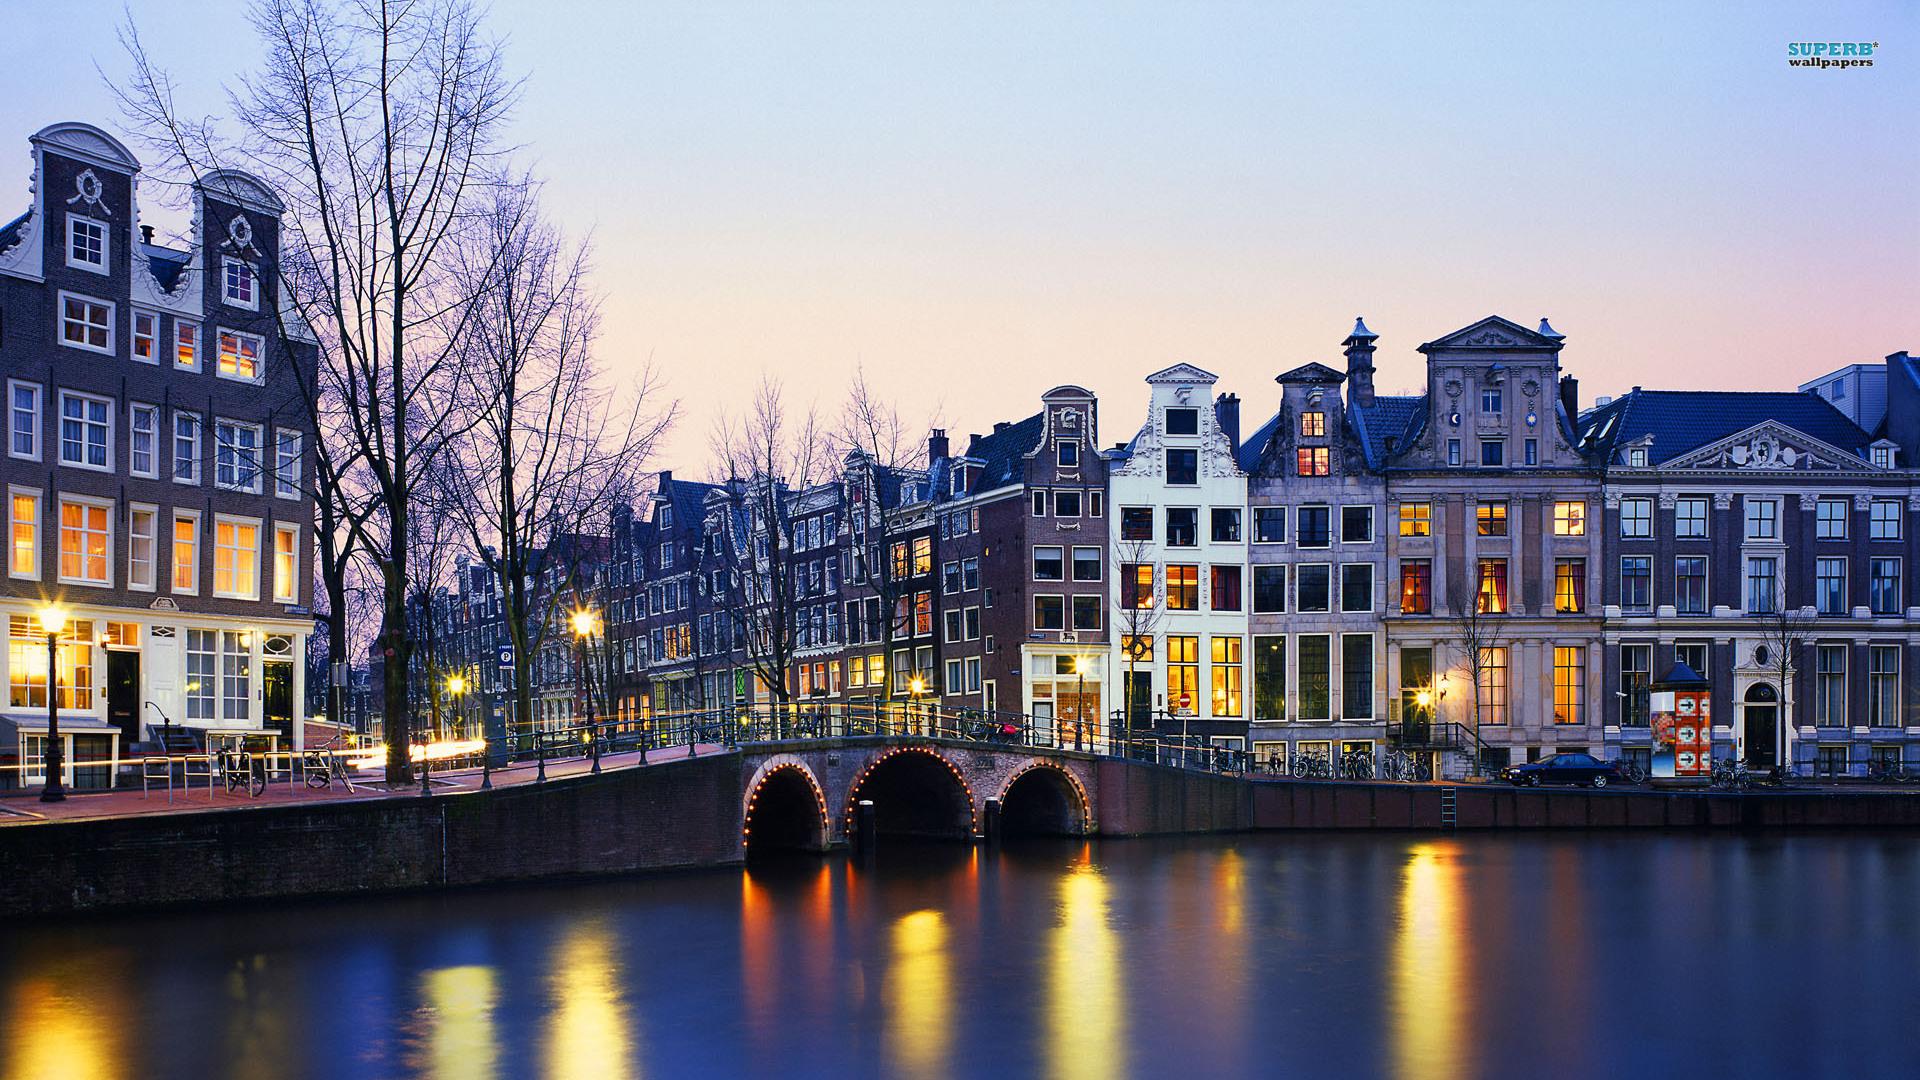 amsterdam-5068-1920x1080